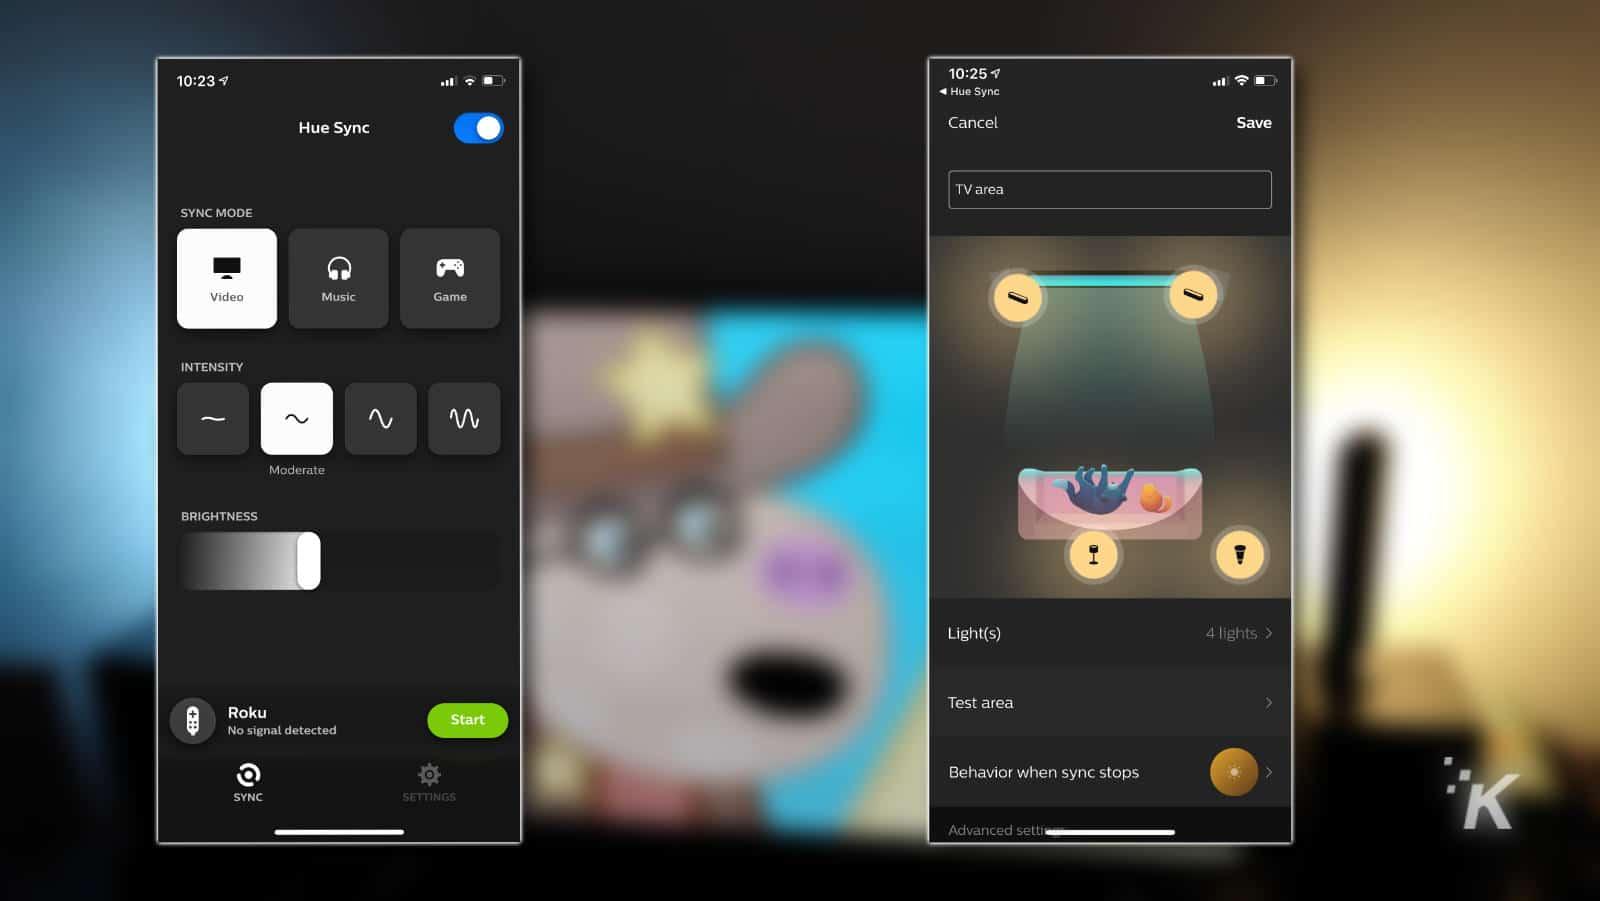 philips app features